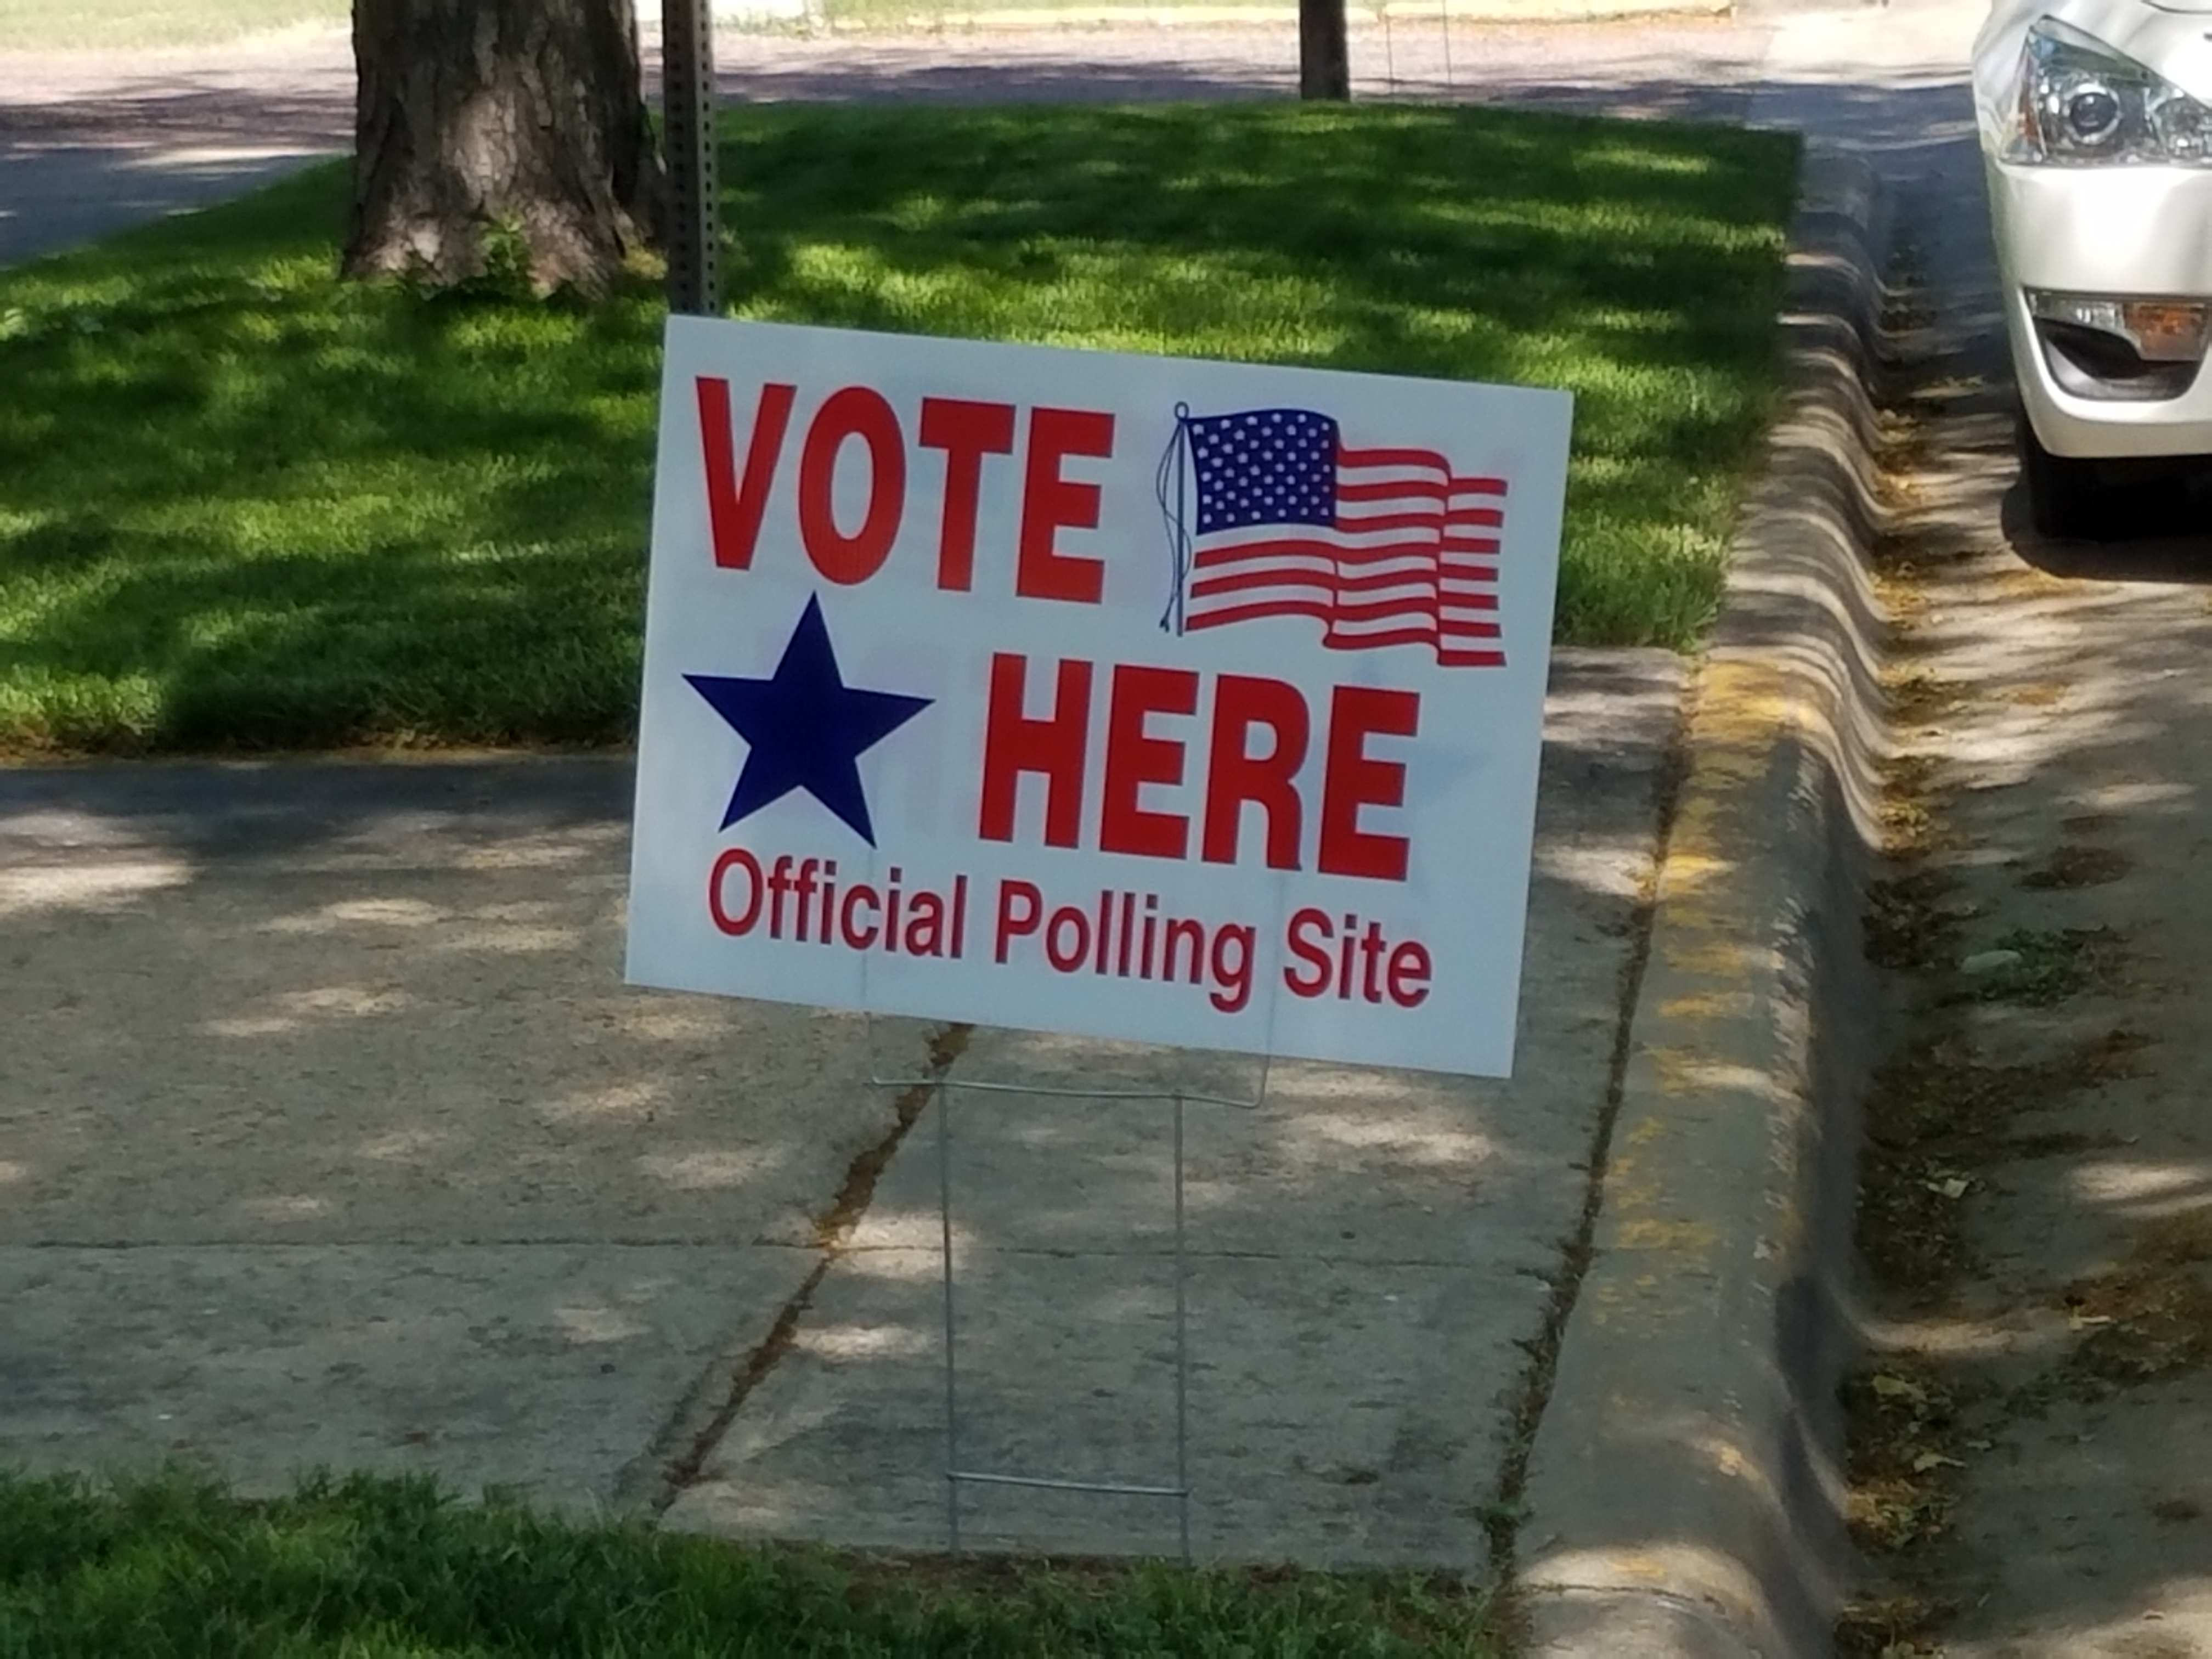 Kleinsasser, Cronin Win Stanley County School Board Election